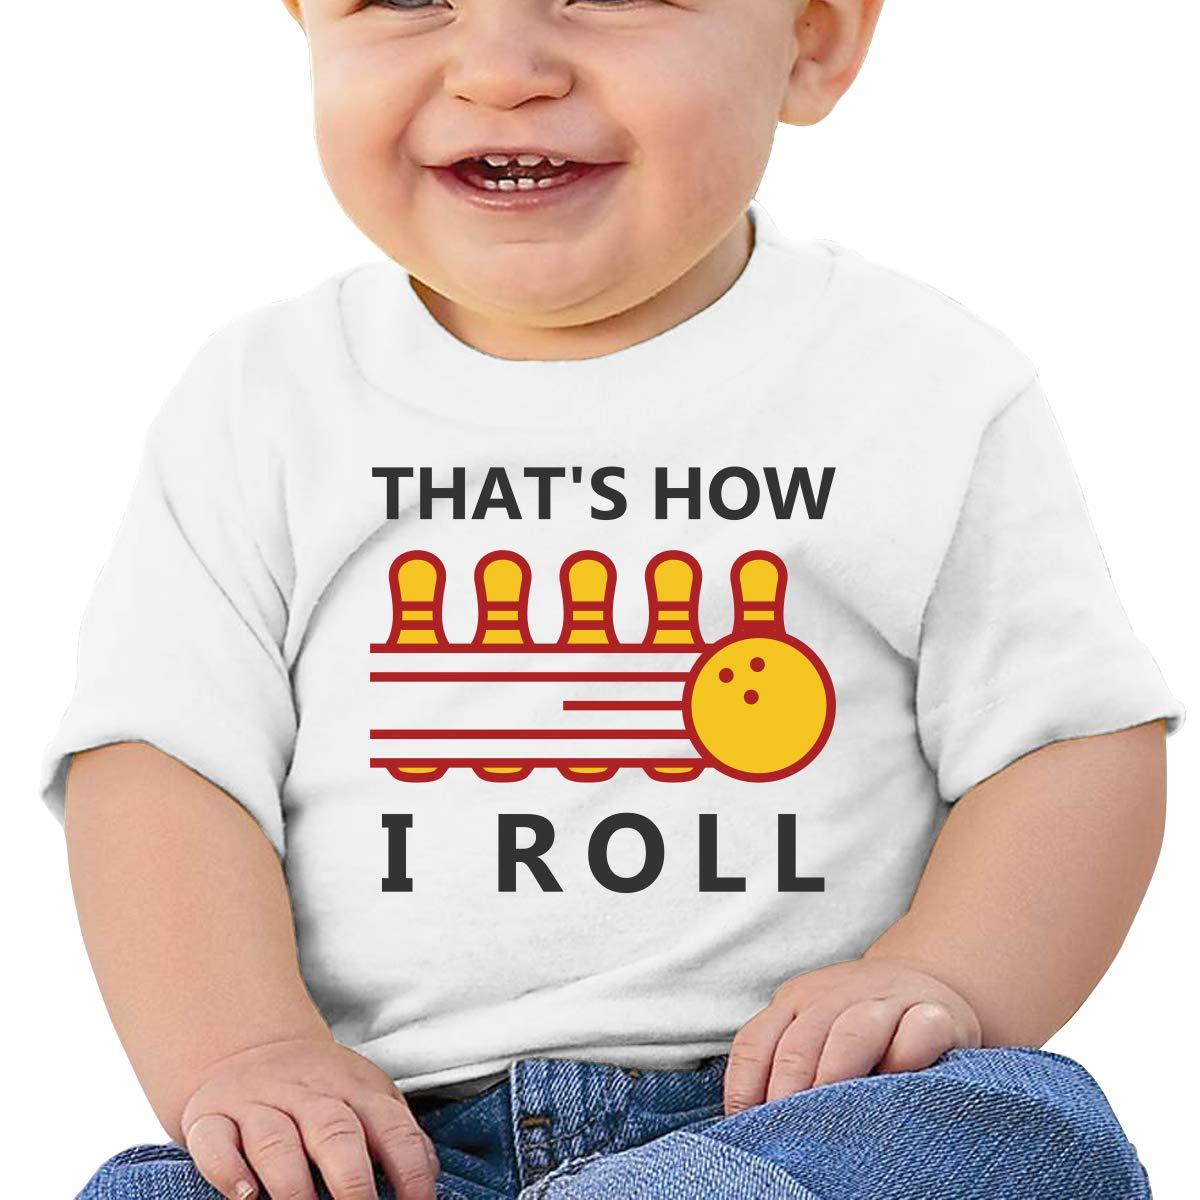 Qiop Nee Thats How I Roll Bowling Short-Sleeves T-Shirt Baby Boy